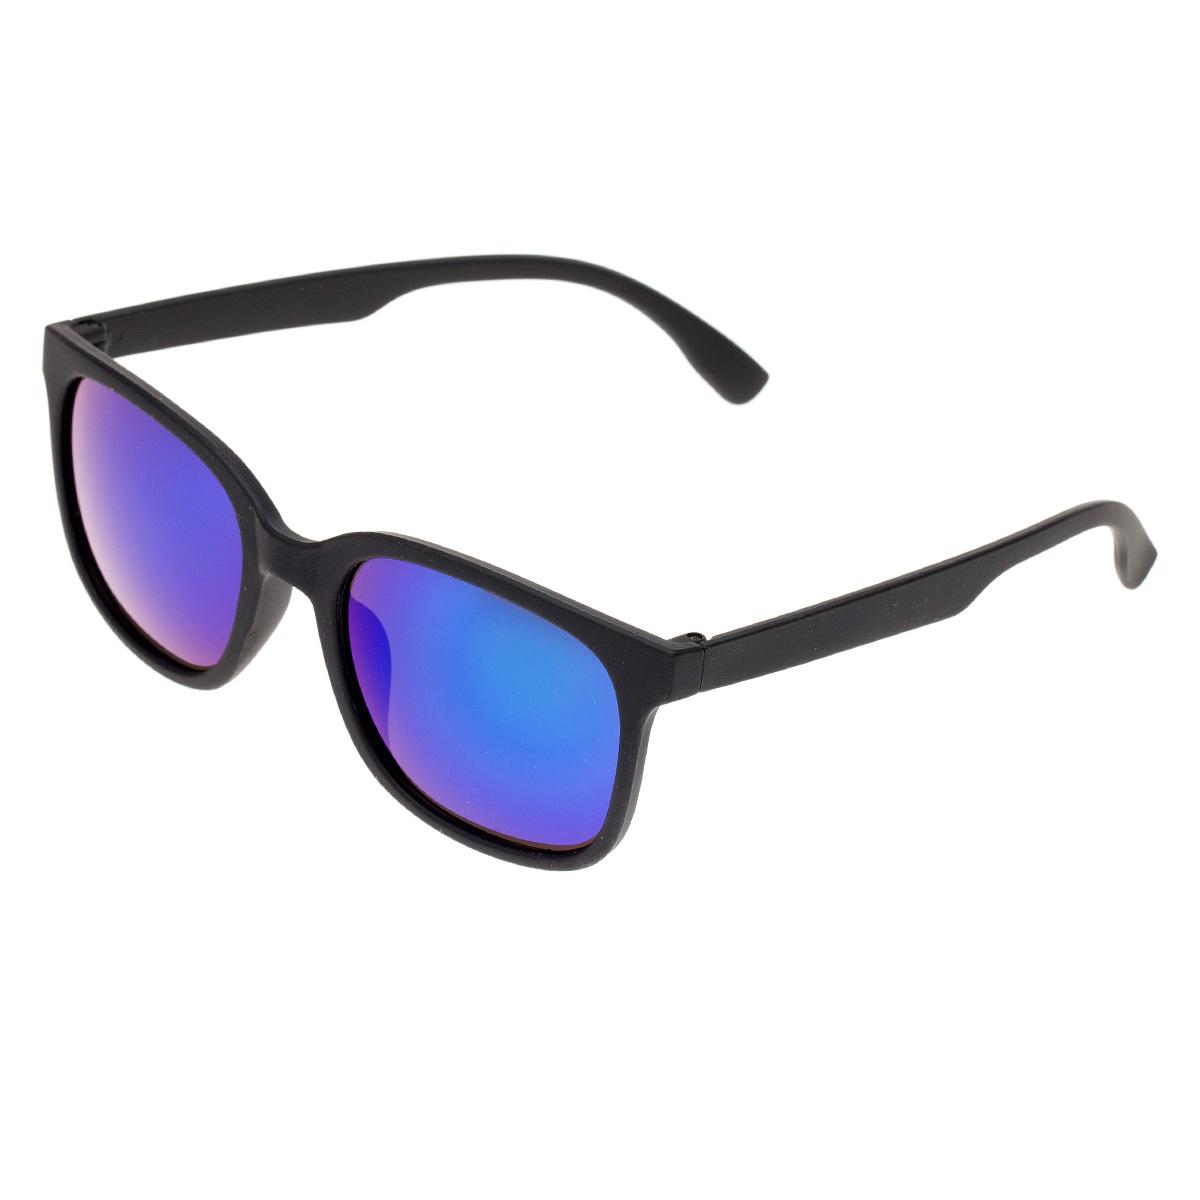 Фото - Очки солнцезащитные Sevenext, 23032-51 очки солнцезащитные sevenext 23032 28